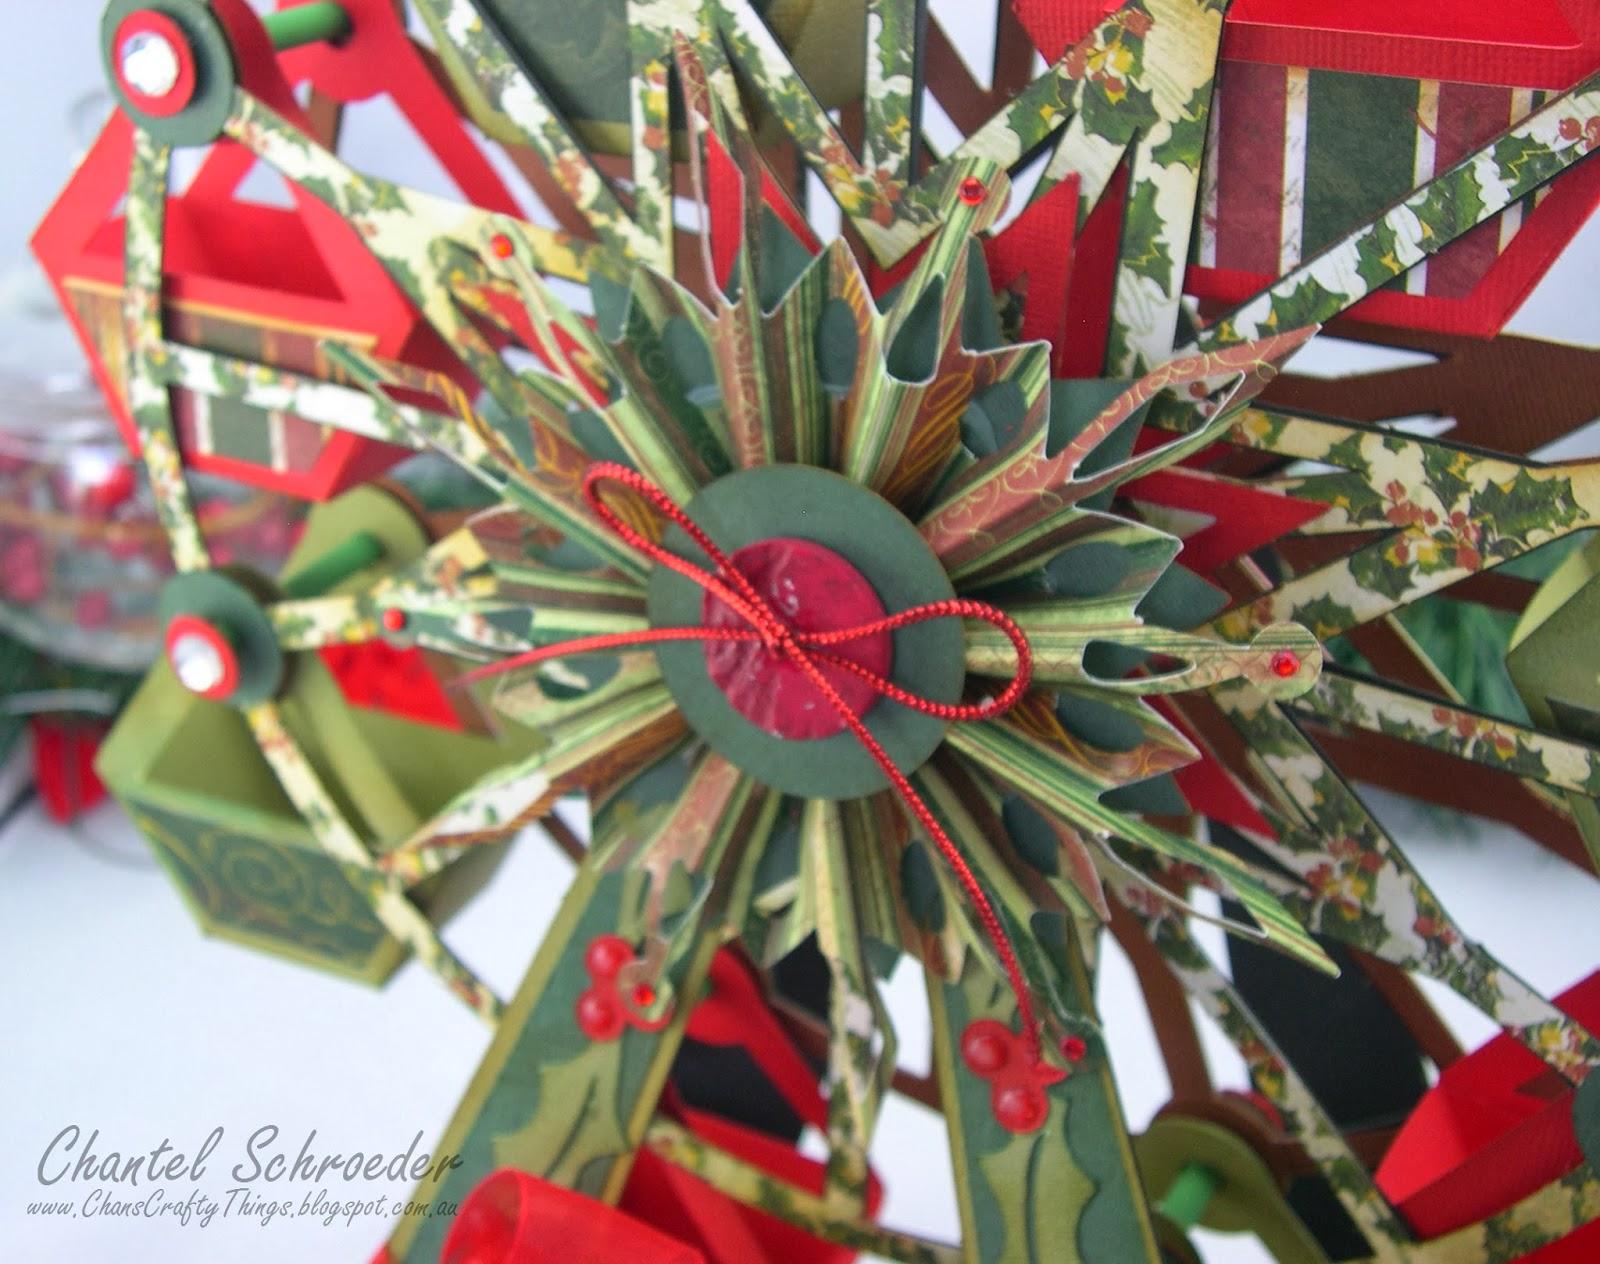 Chan's Crafty Things: Christmas Ferris Wheel